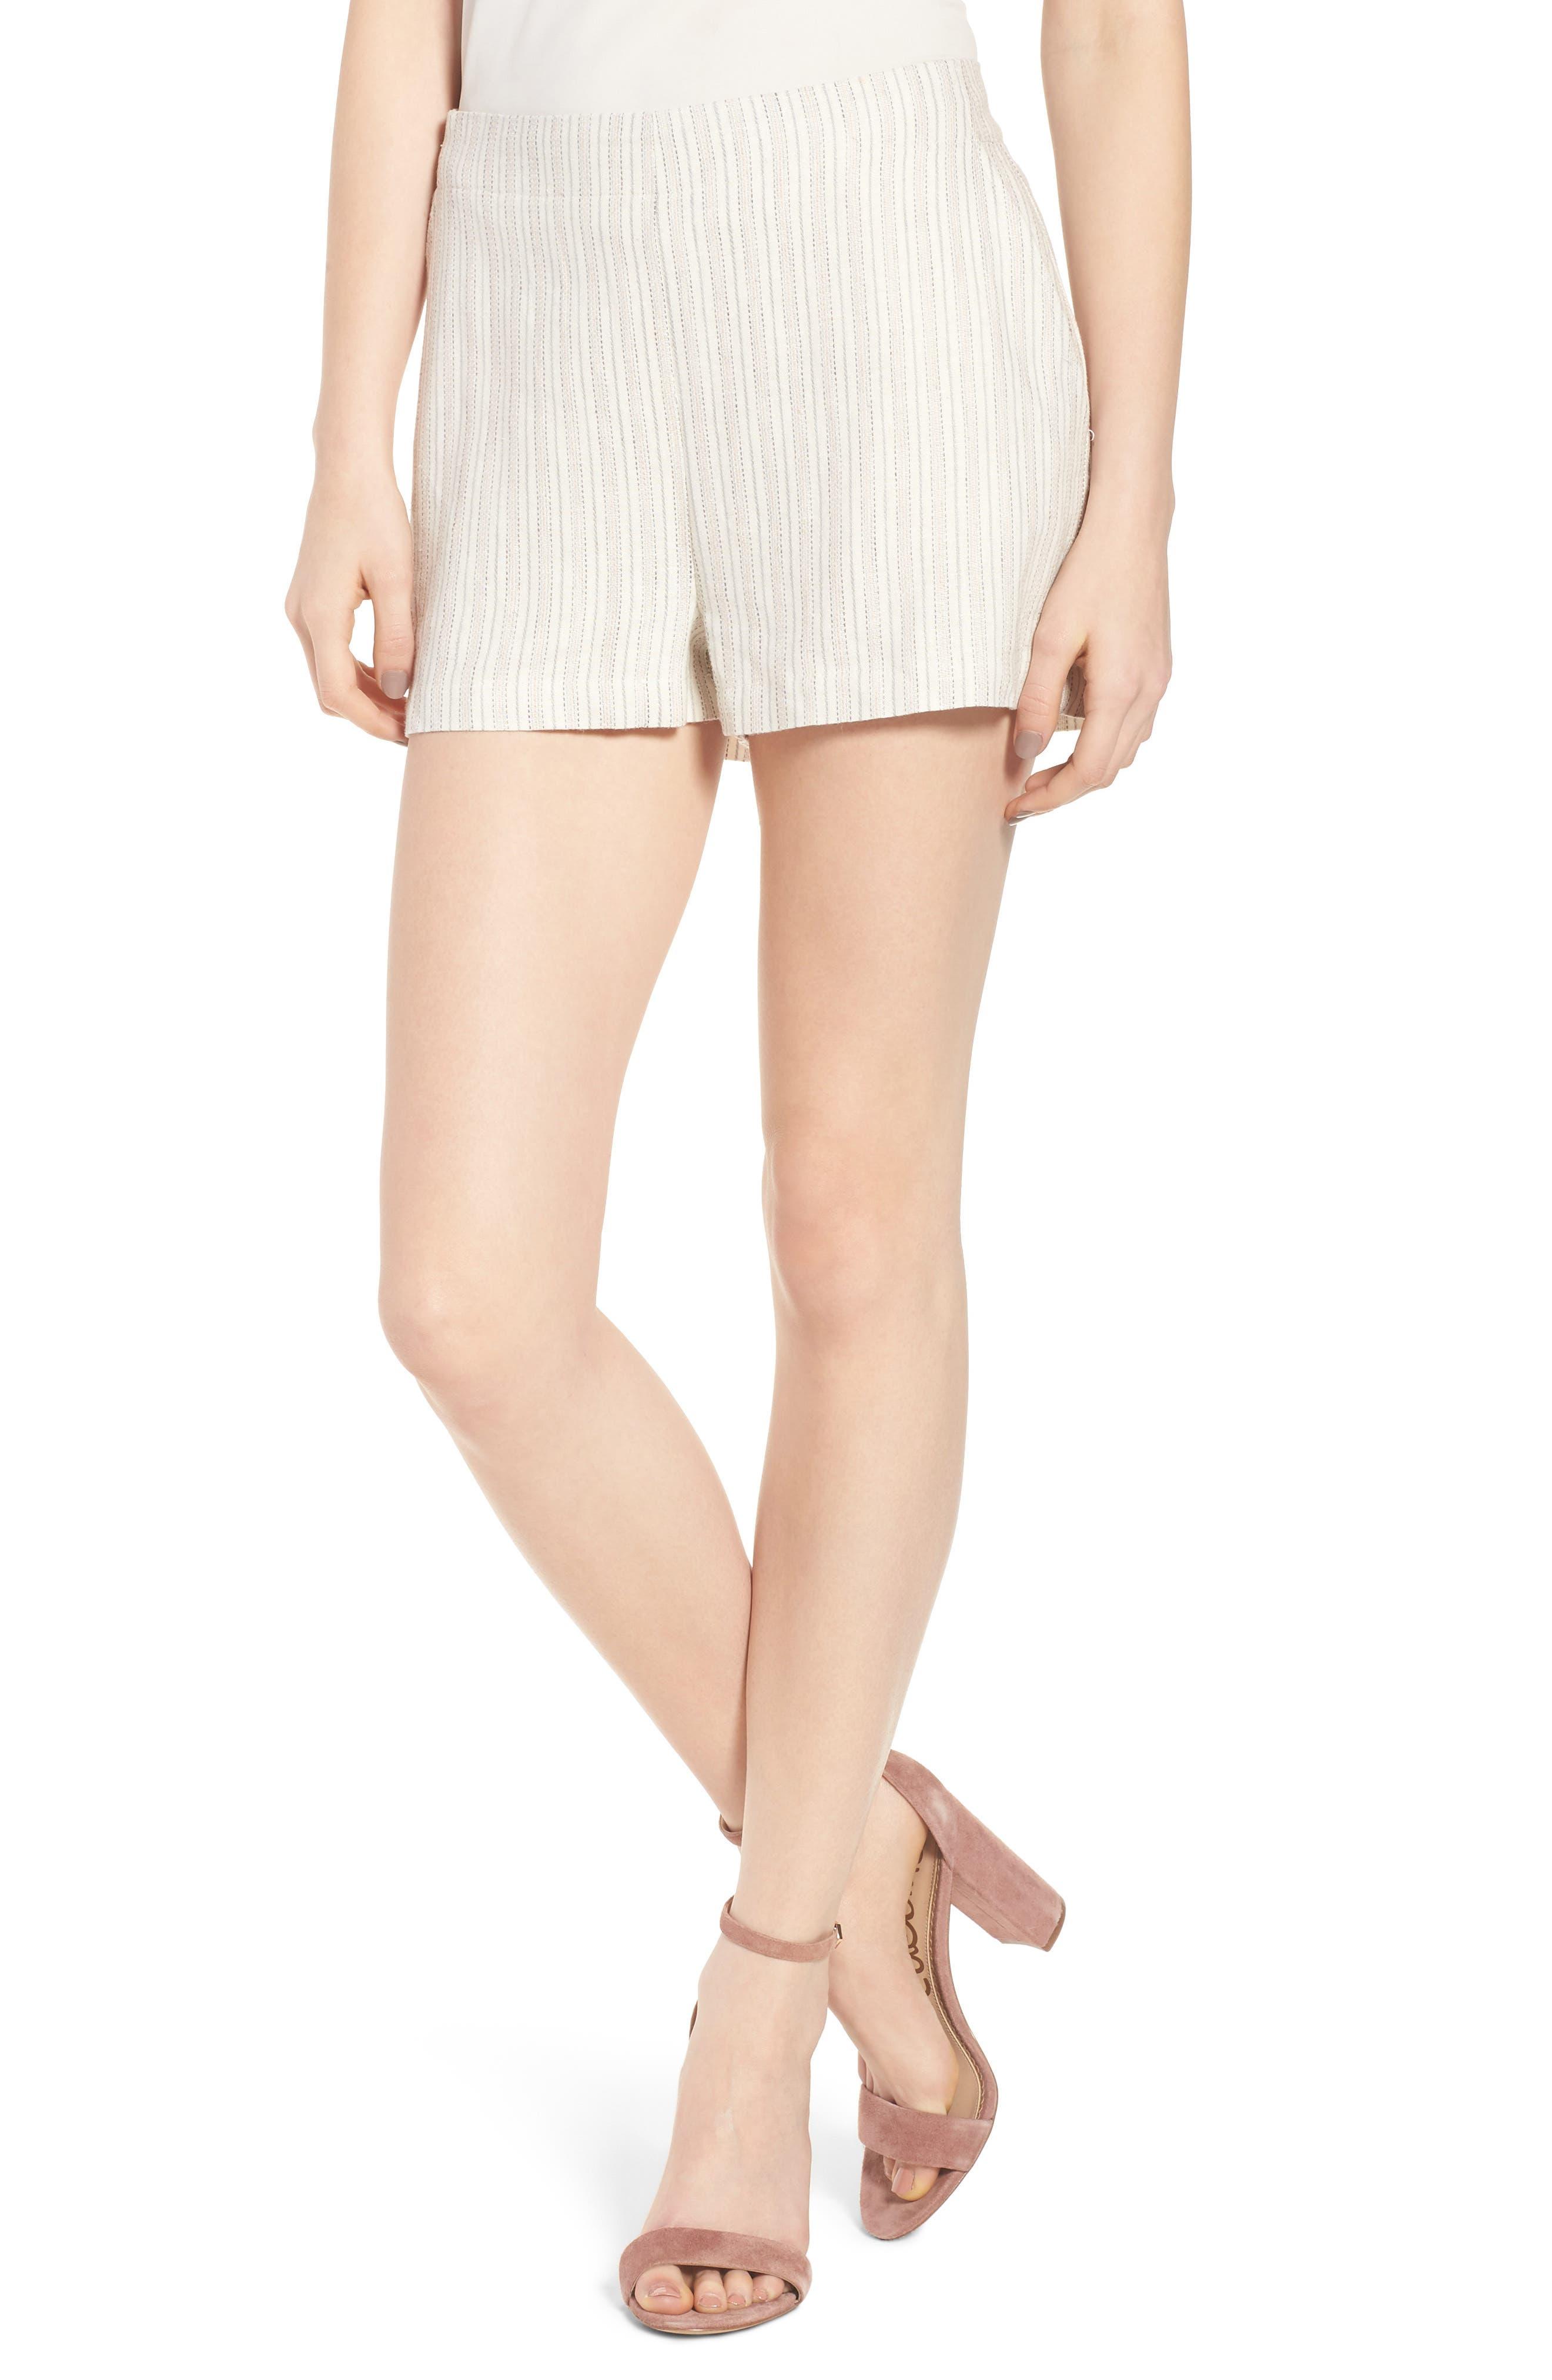 Alta Shorts,                         Main,                         color, Ivory